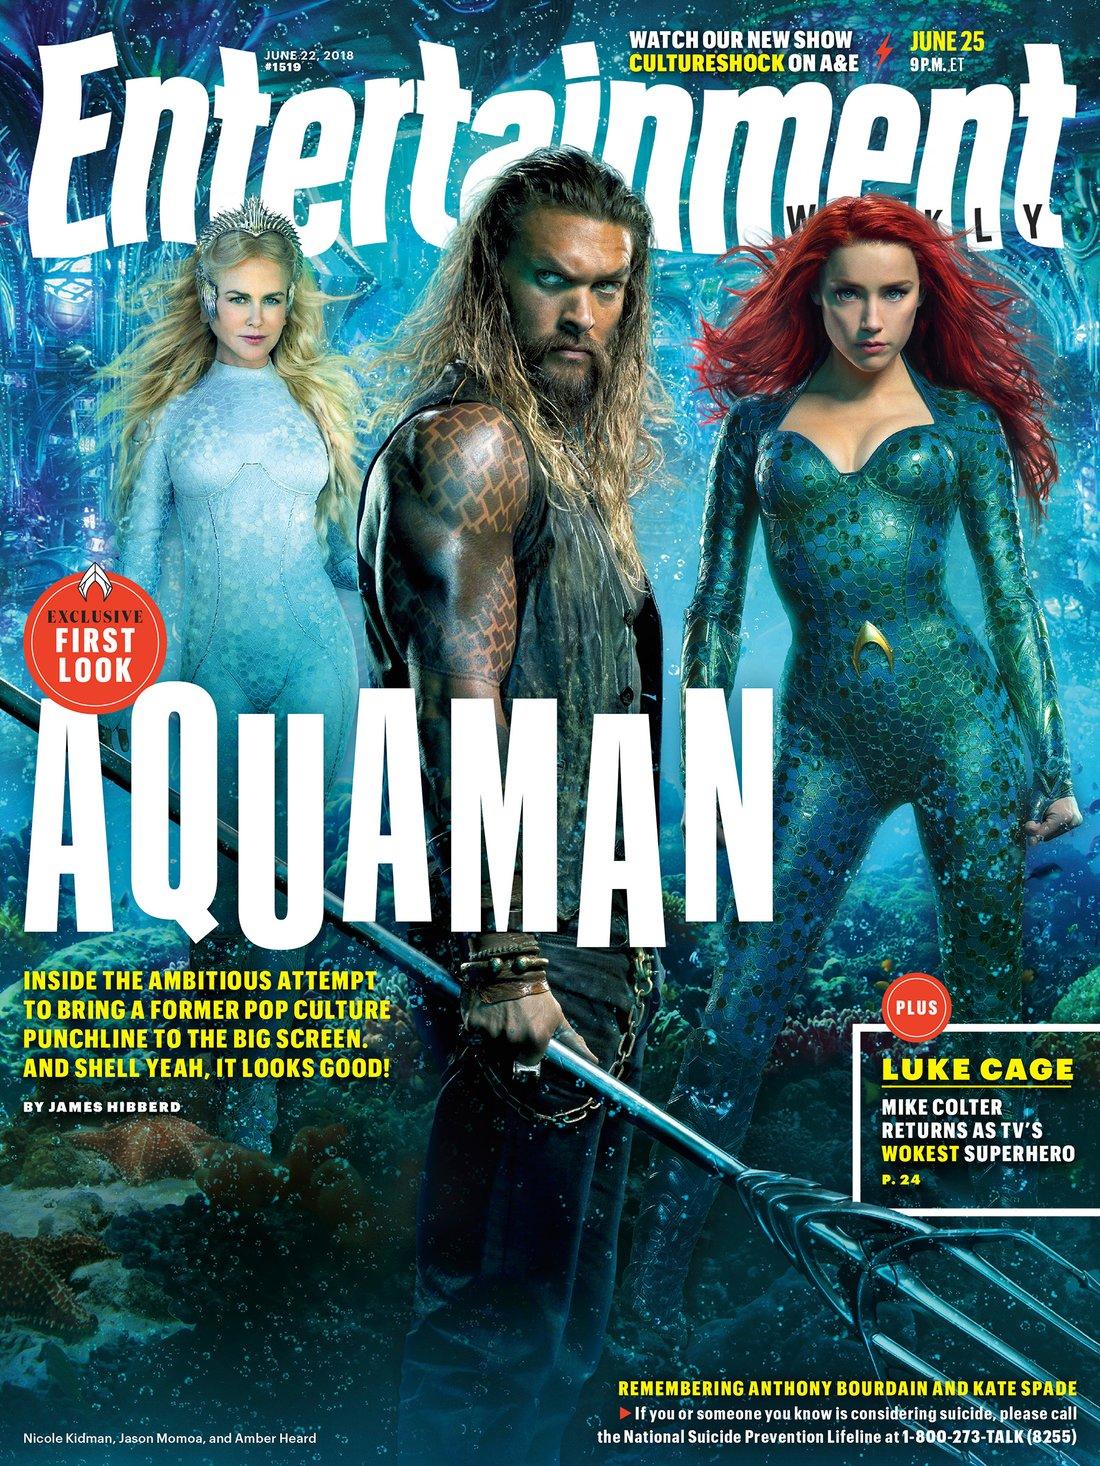 Entertainment Weekly - Aquaman Cover - June 2018